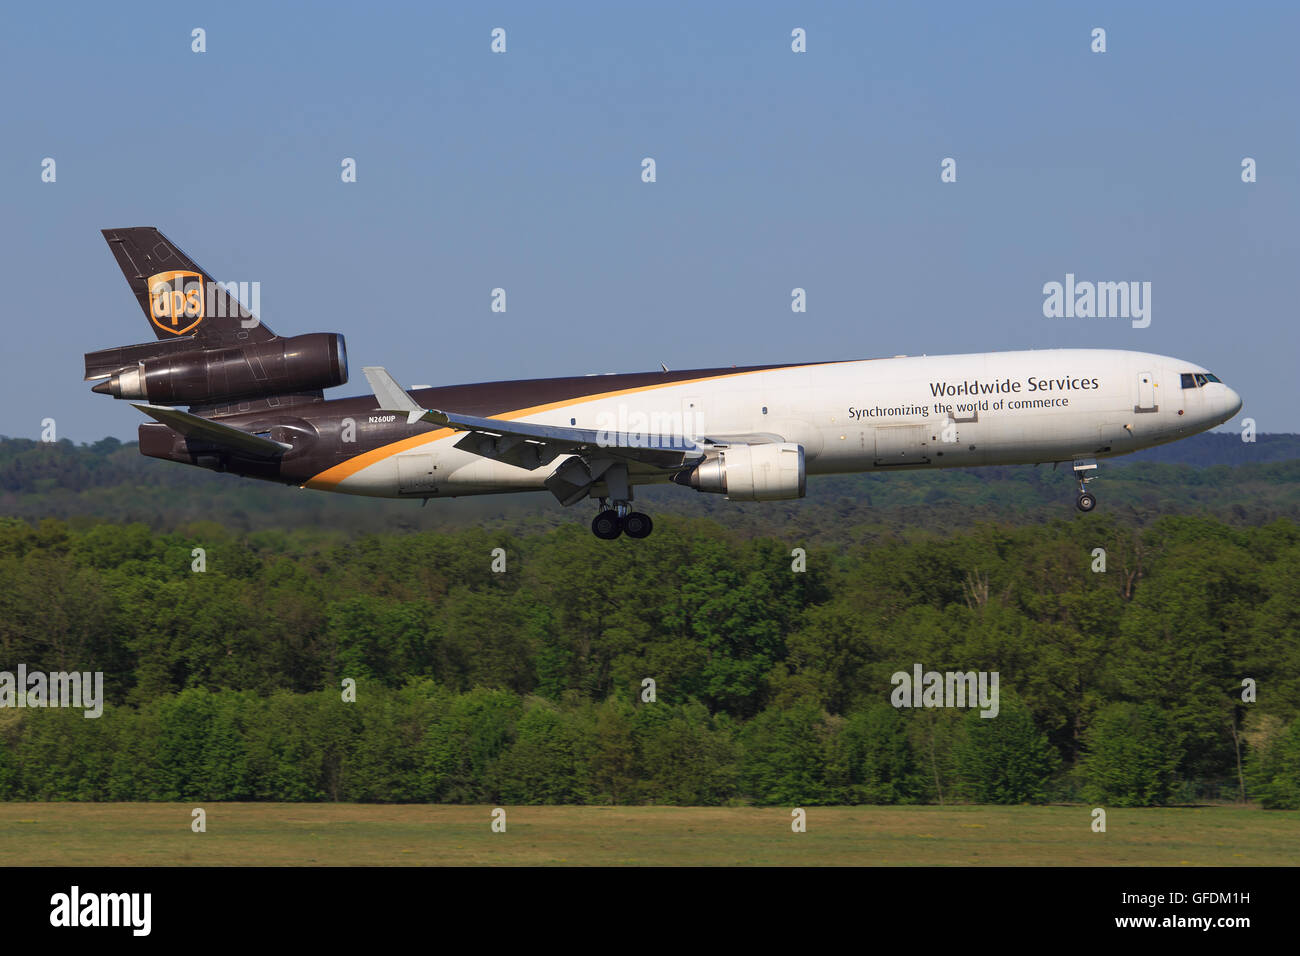 Köln/Germany march 12, 2016: MD11 from UPS landing at Köln Airport - Stock Image